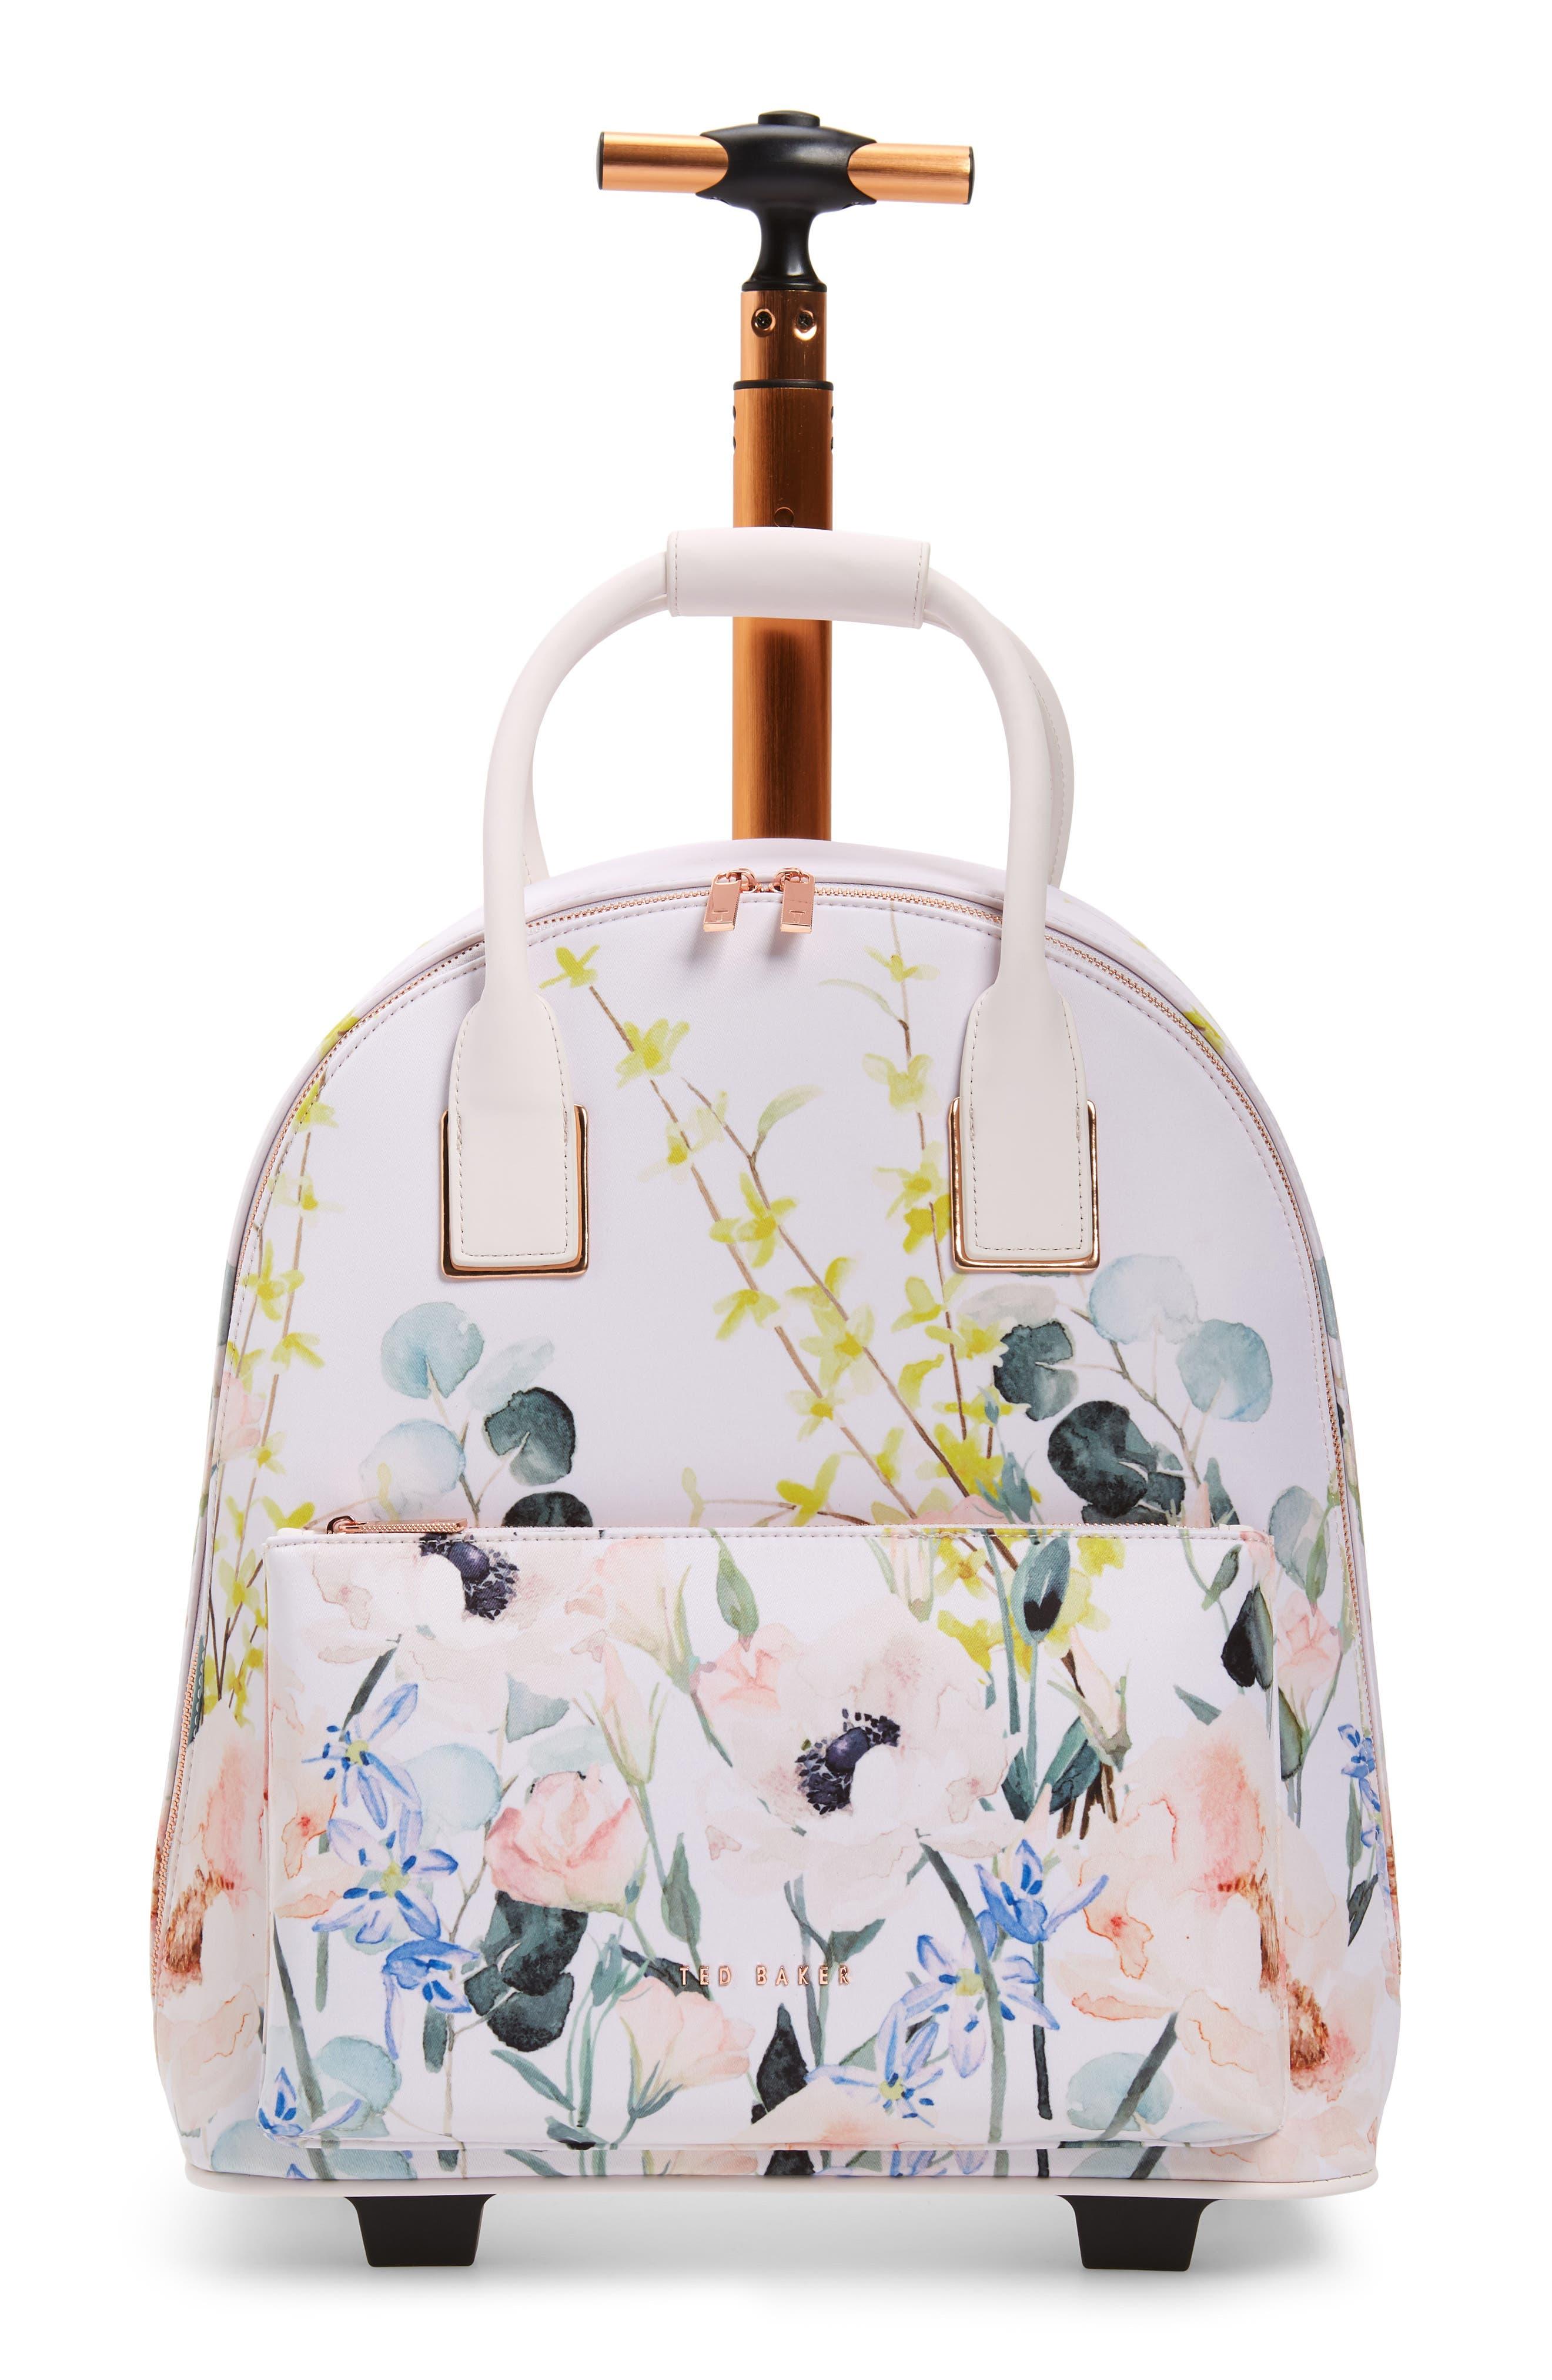 TED BAKER LONDON Elianna Elegant Travel Bag, Main, color, NUDE PINK